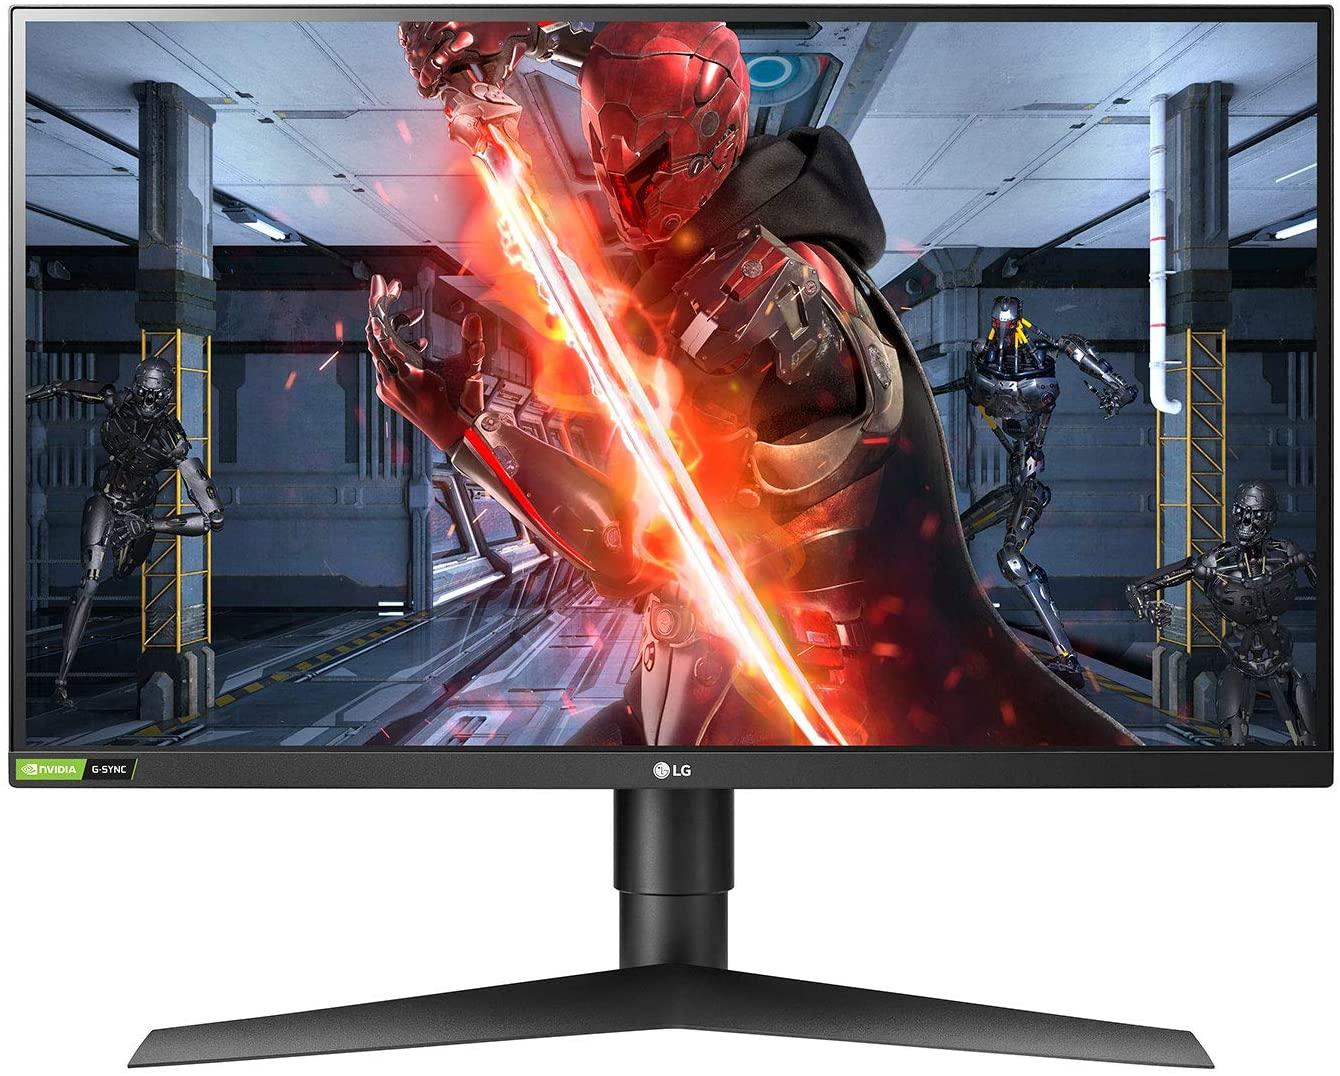 LG Ultragear 27GL83A-B 27 Inch IPS Gaming Monitor - WQHD - 1MS - Nvidia G-Sync - £401.85 Delivered - Amazon.de